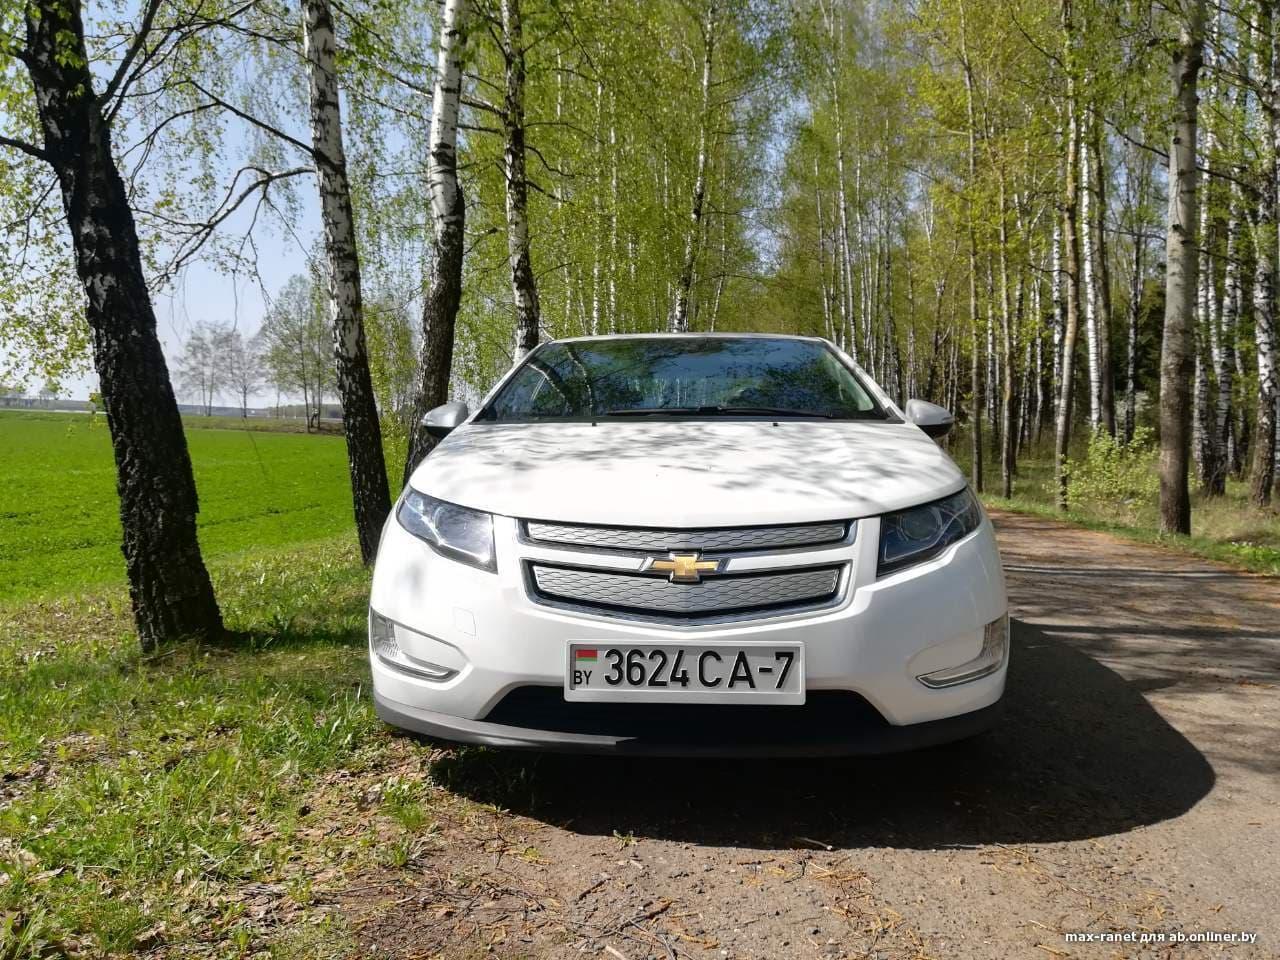 Chevrolet Volt EV